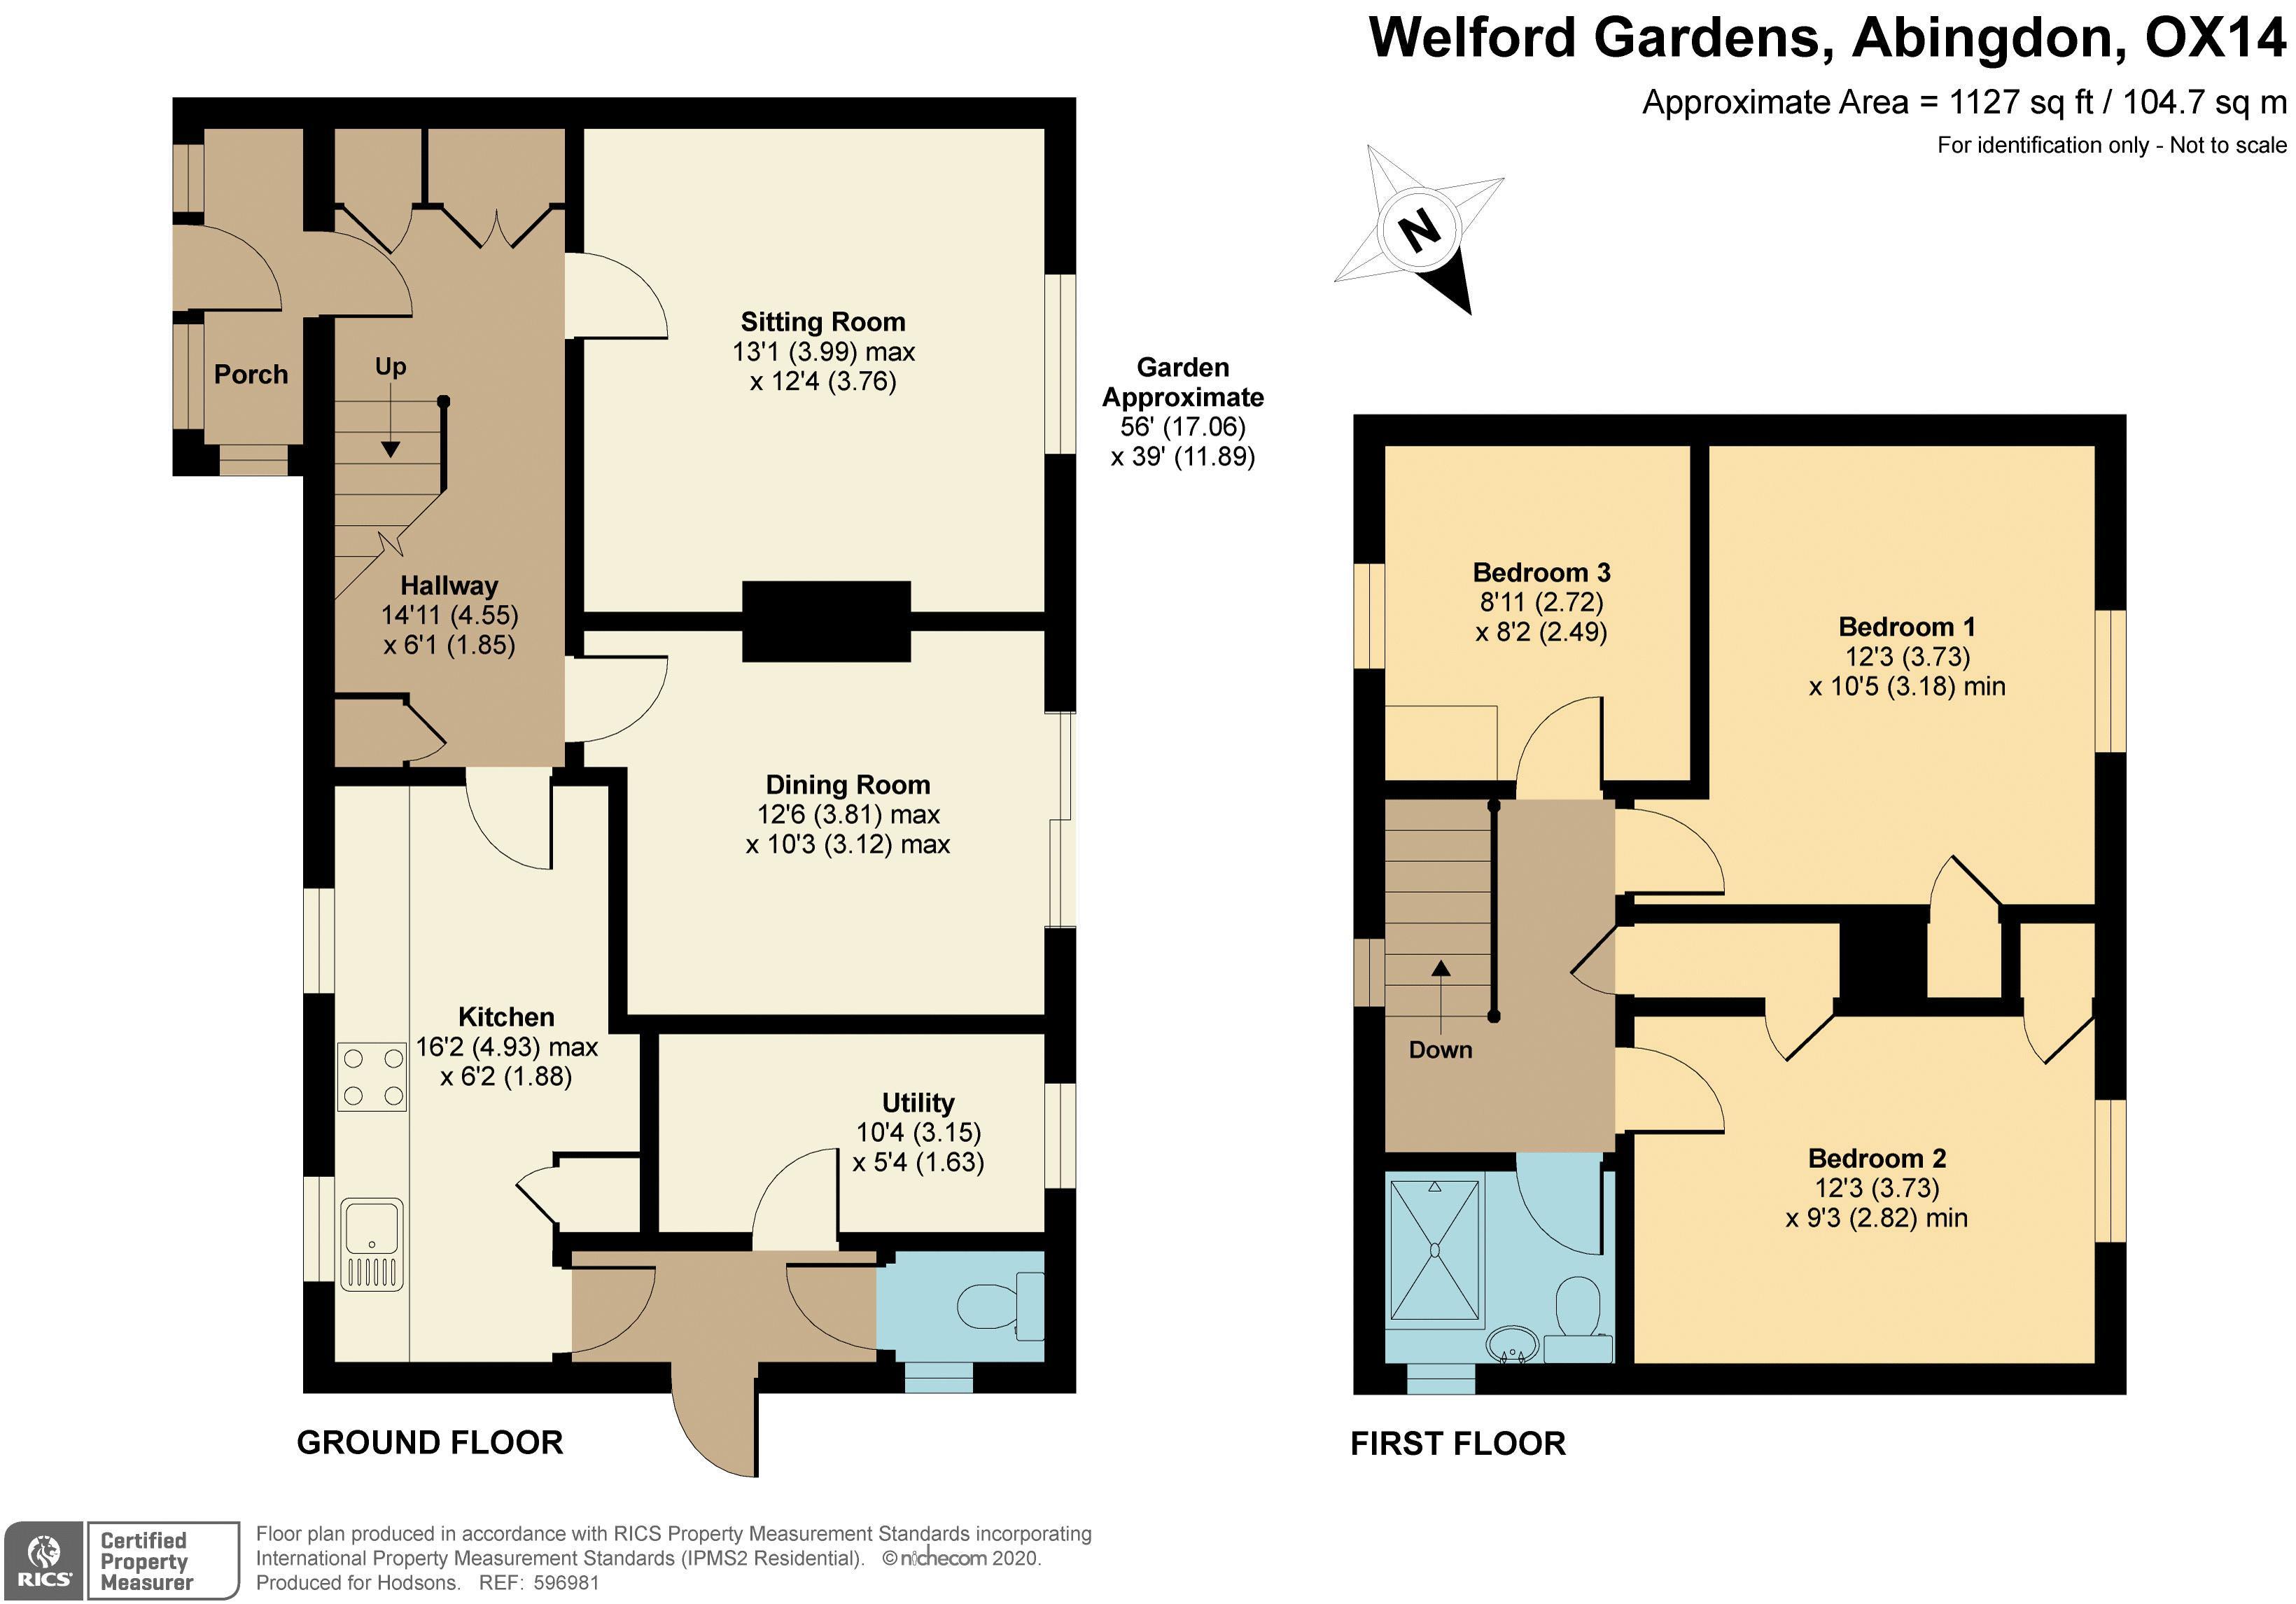 Welford Gardens